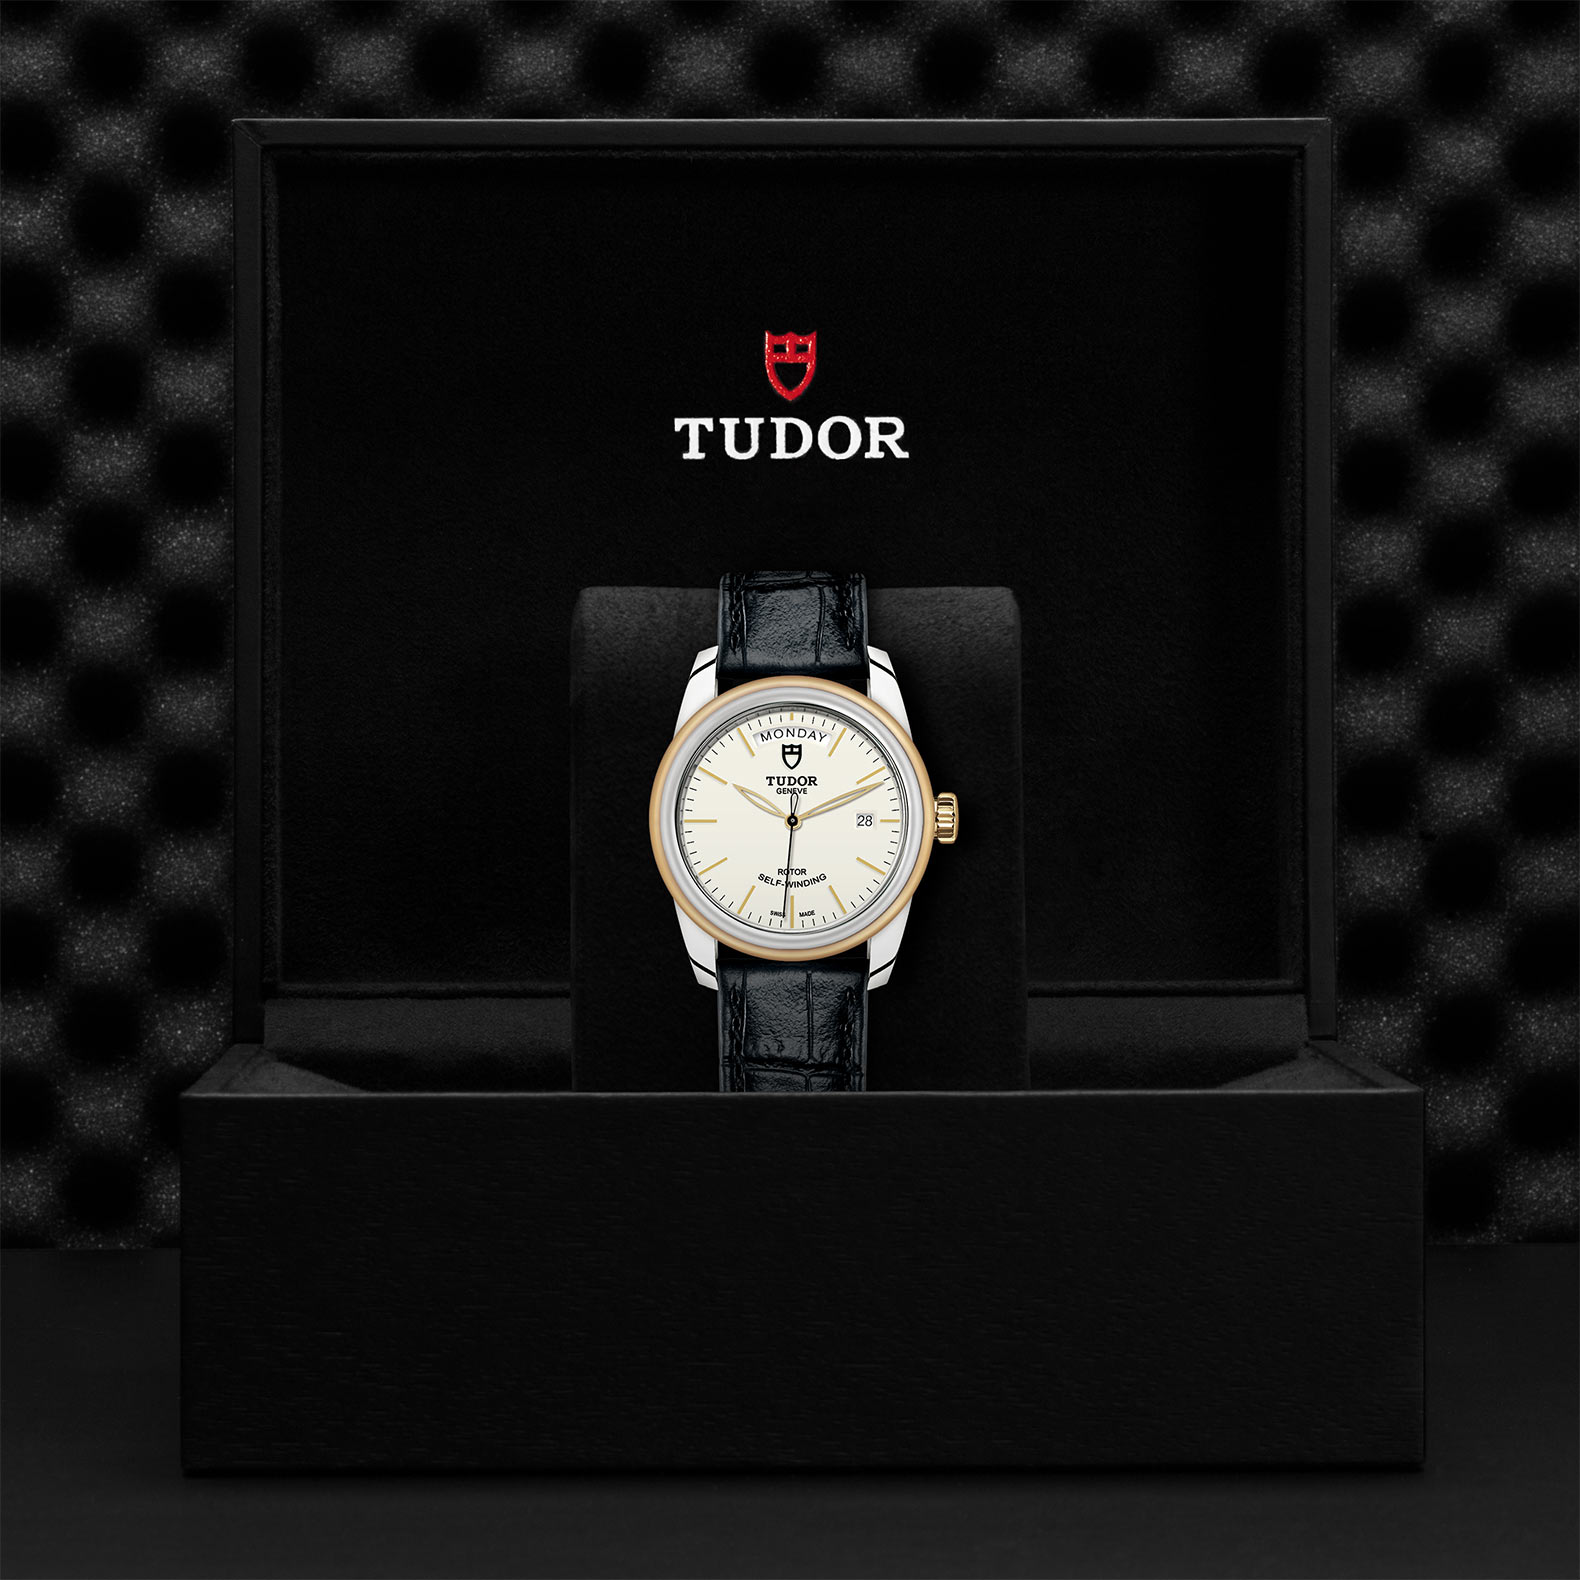 TUDOR Glamour Date Day M56003 0107 Presentationbox